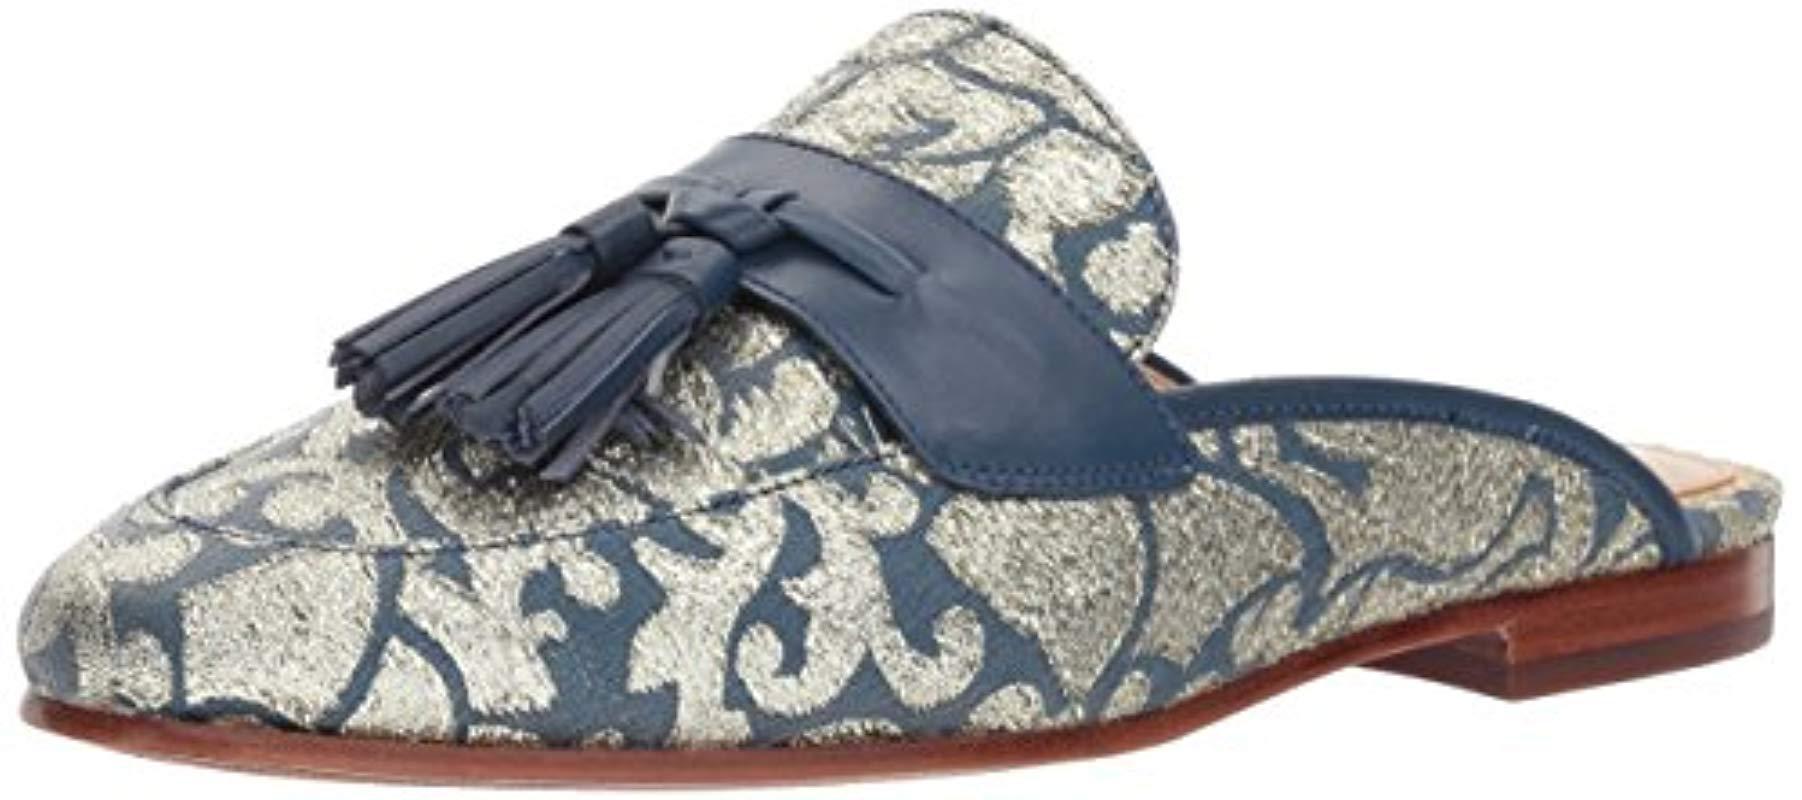 9c3dc94493c2c Lyst - Sam Edelman Paris Slip-on Loafer in Blue - Save 34%